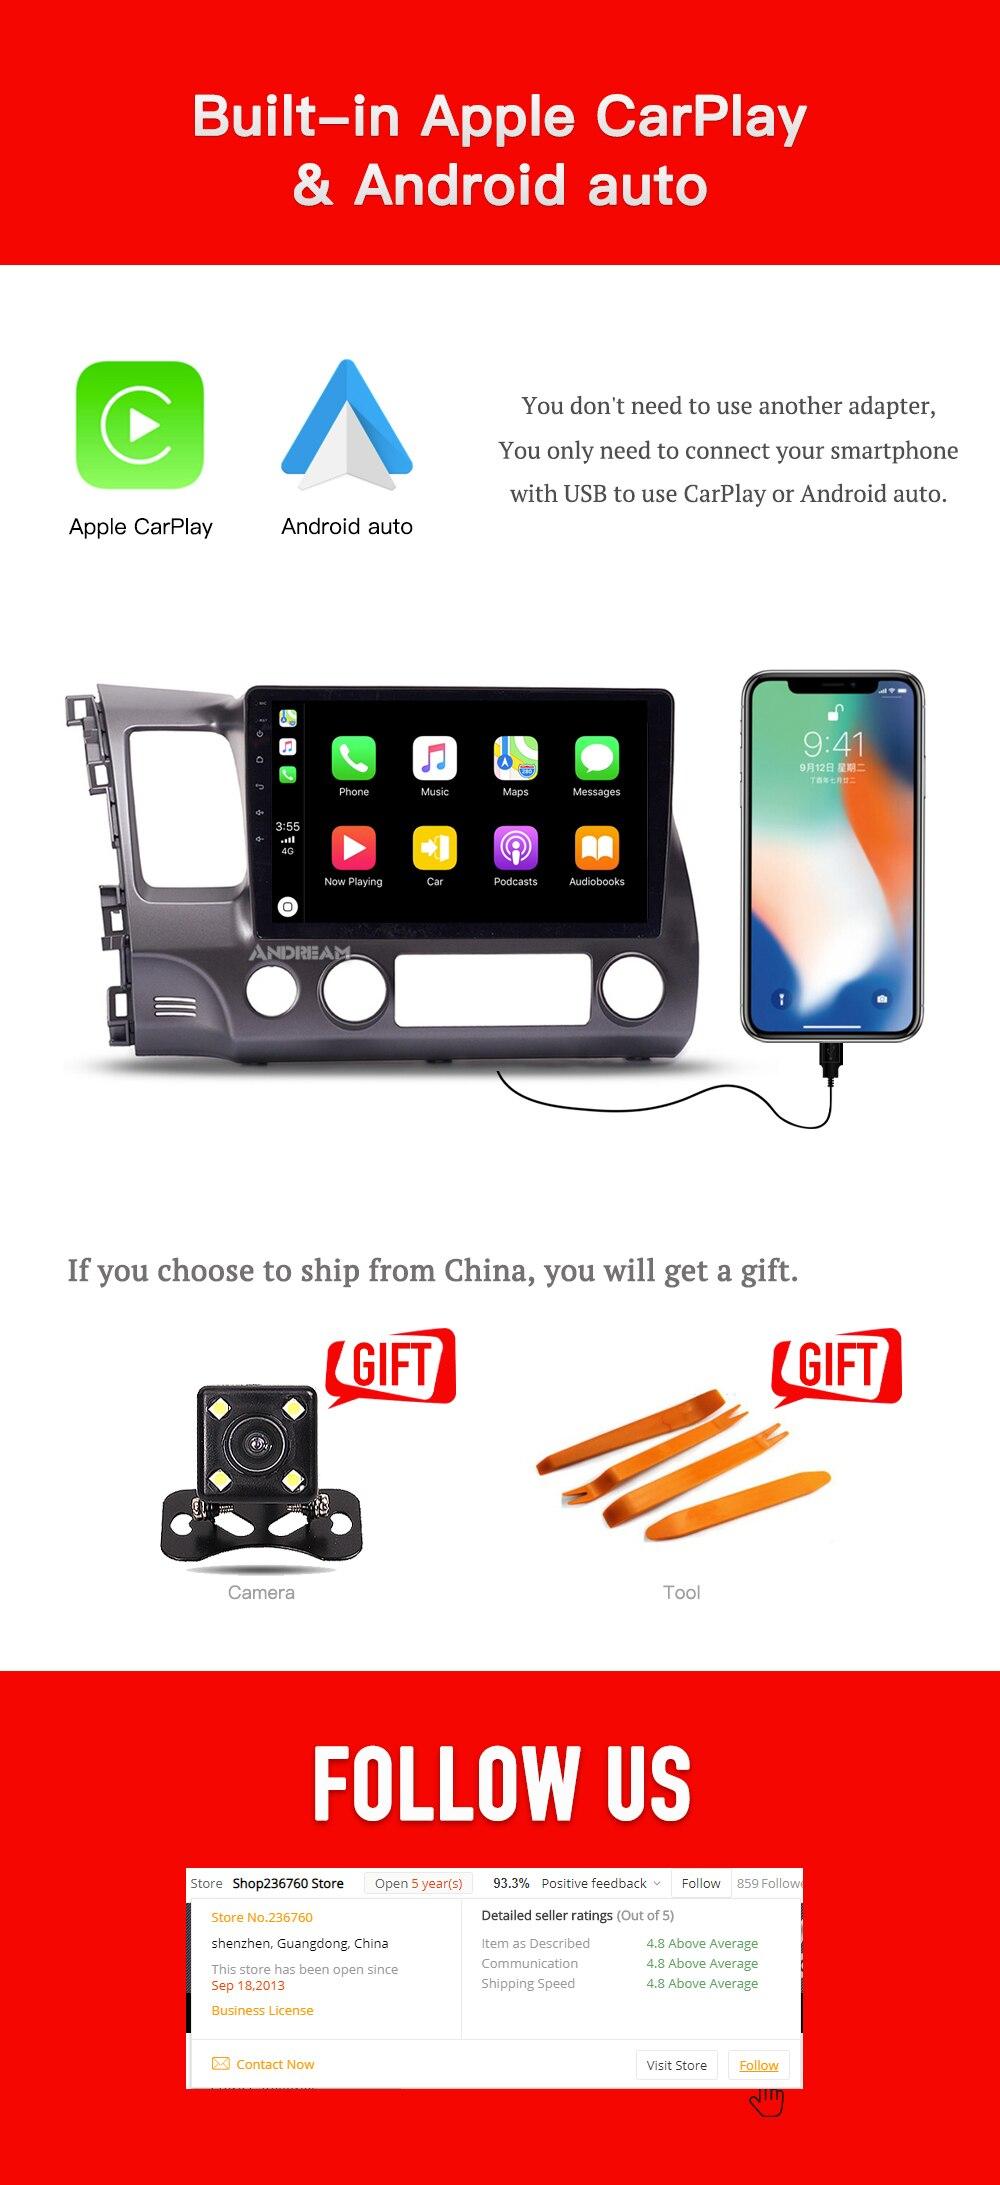 carplay-android-auto-+gift---2